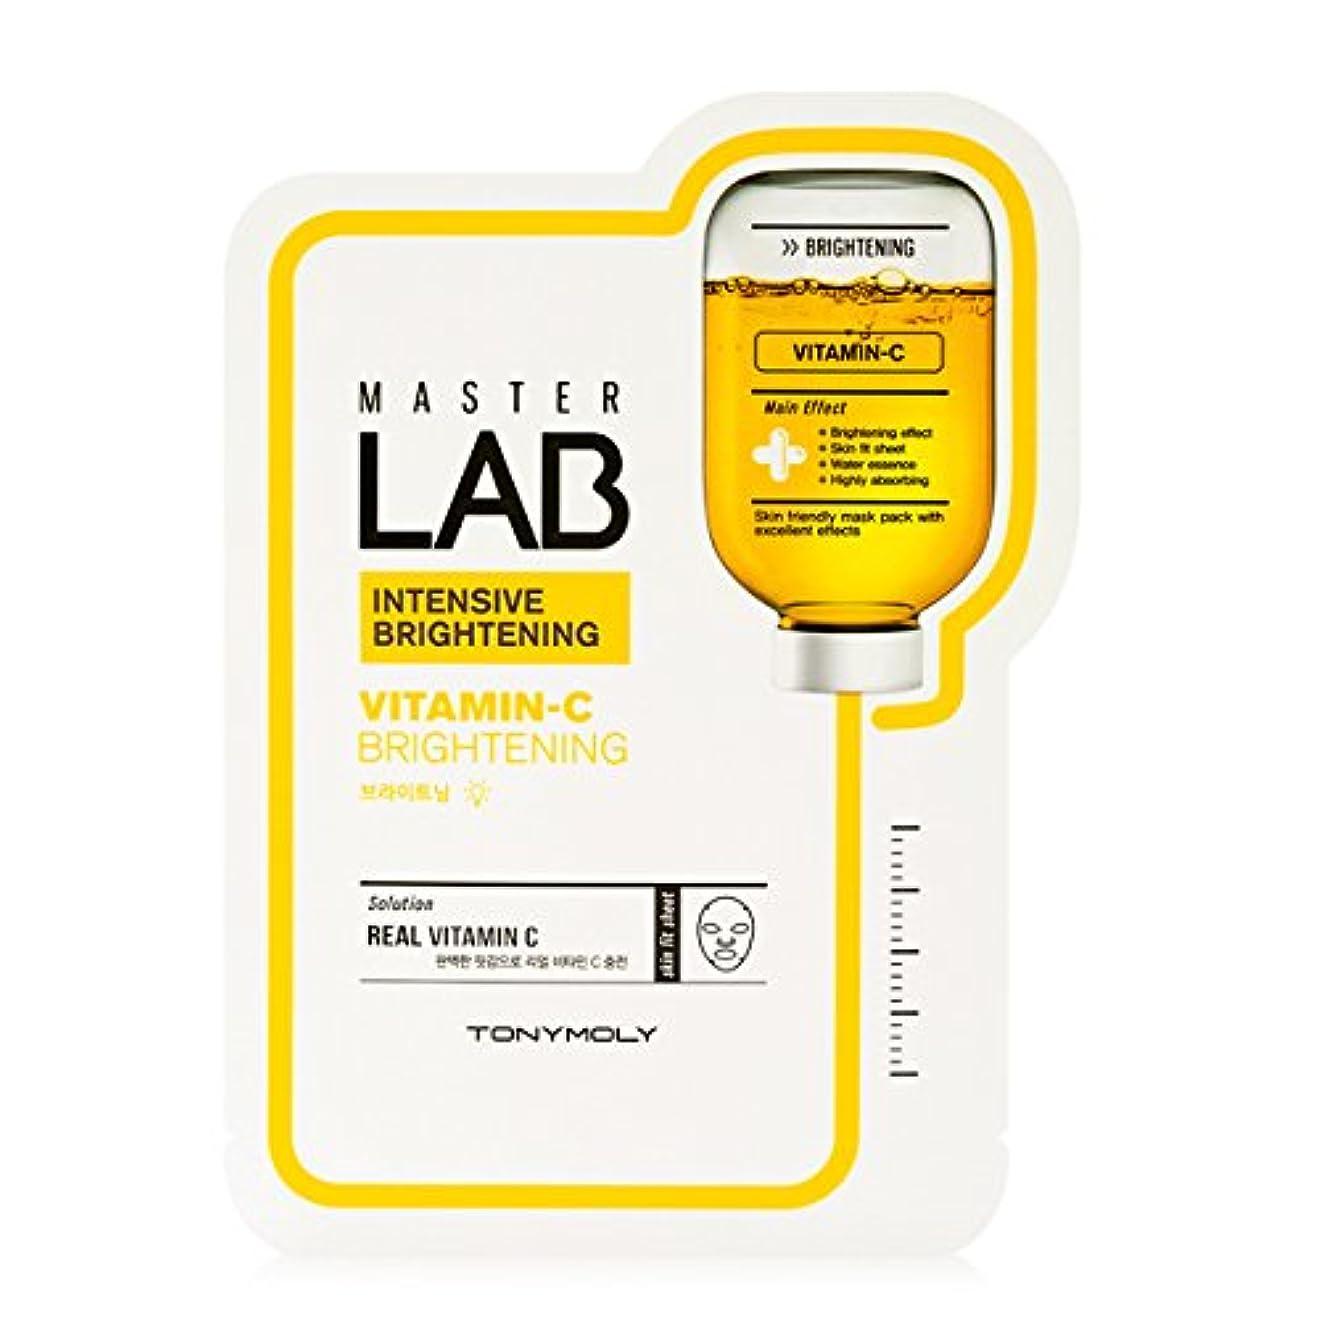 [New] TONYMOLY Master LAB Mask Sheet 19g×5ea/トニーモリー マスター ラブ マスクシート 19g×5枚 (#Vitamin-C:Brightening)